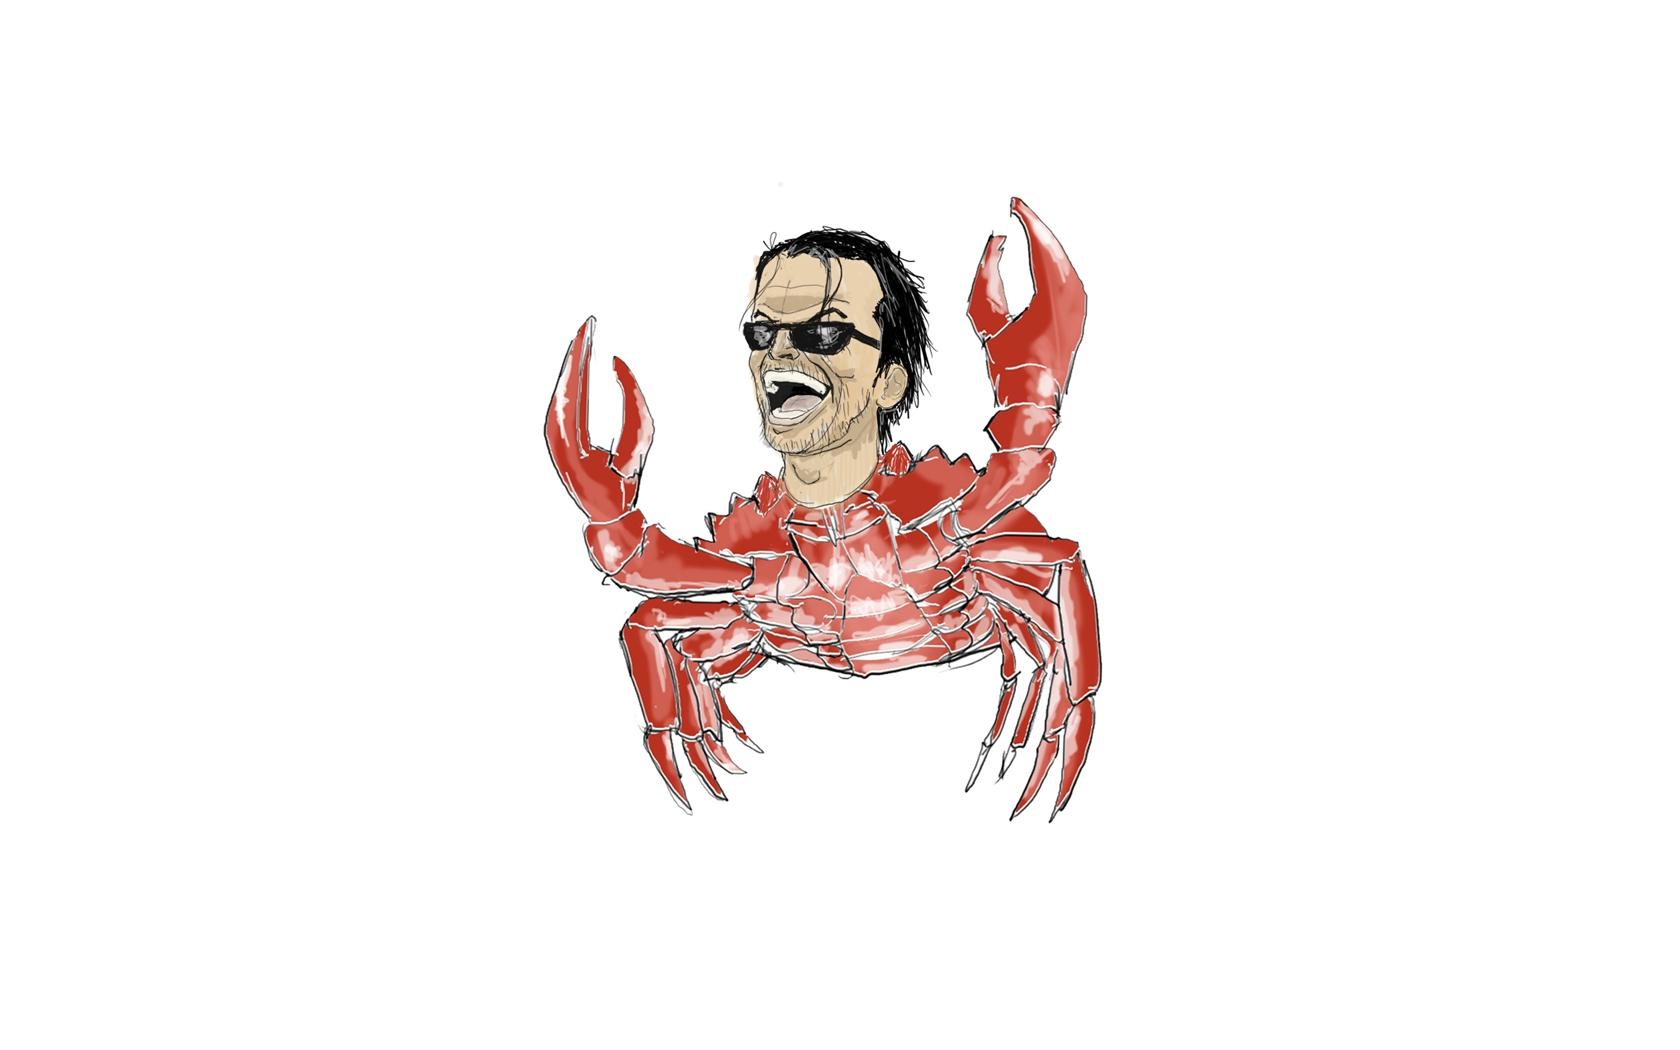 20+ Crab Nicholson Extreme Sleepover Wallpapers